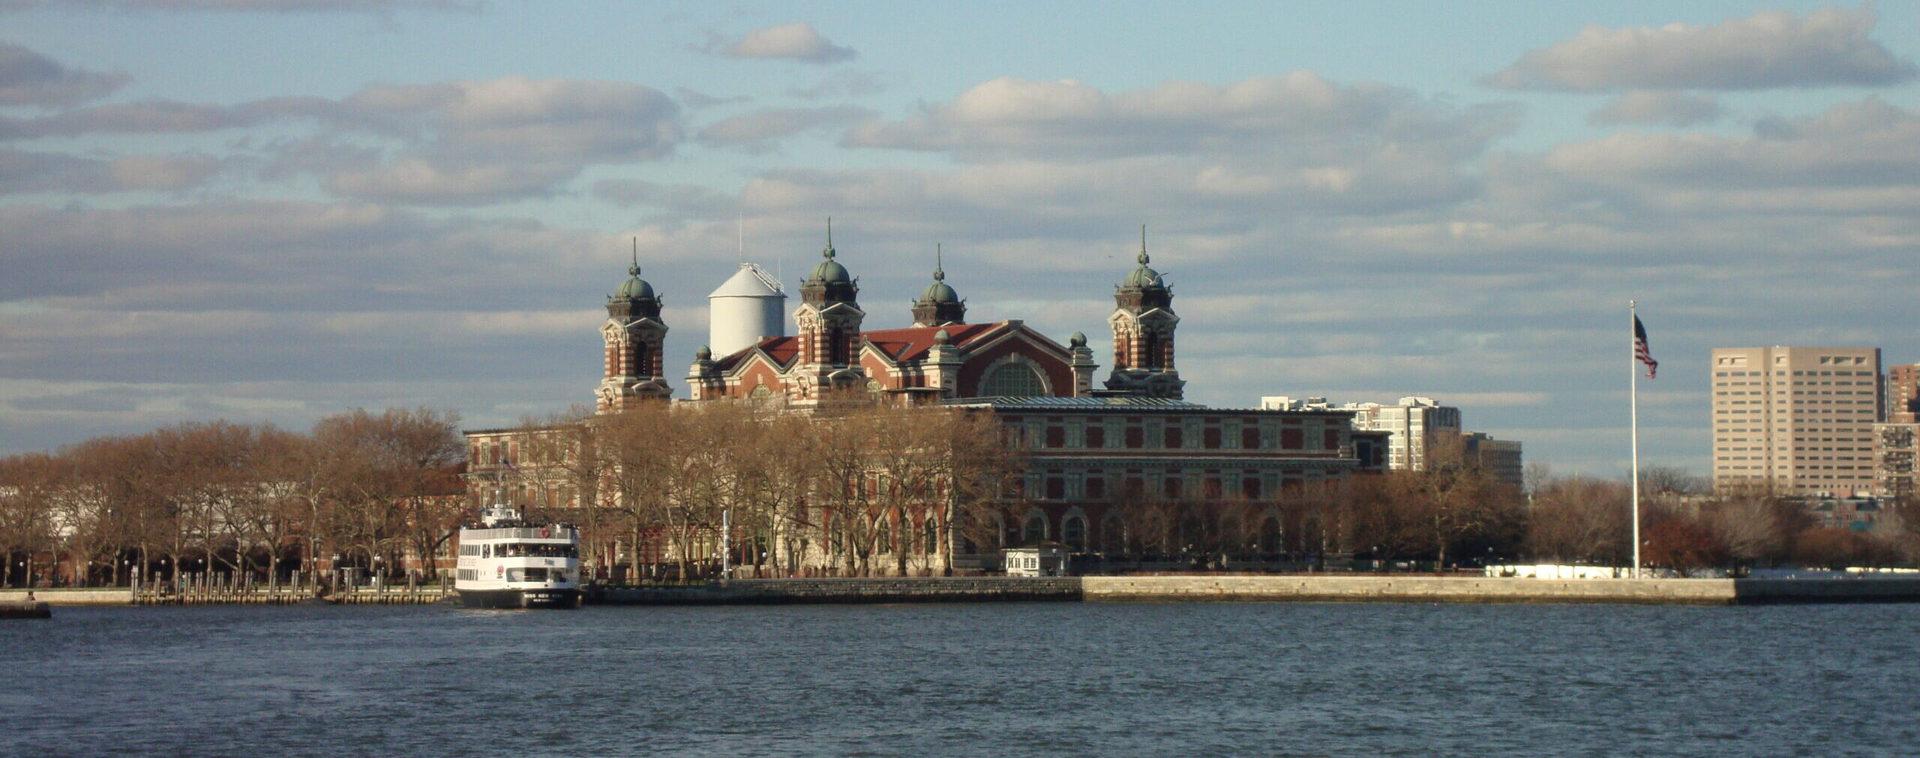 Studietur New York Ellis Island